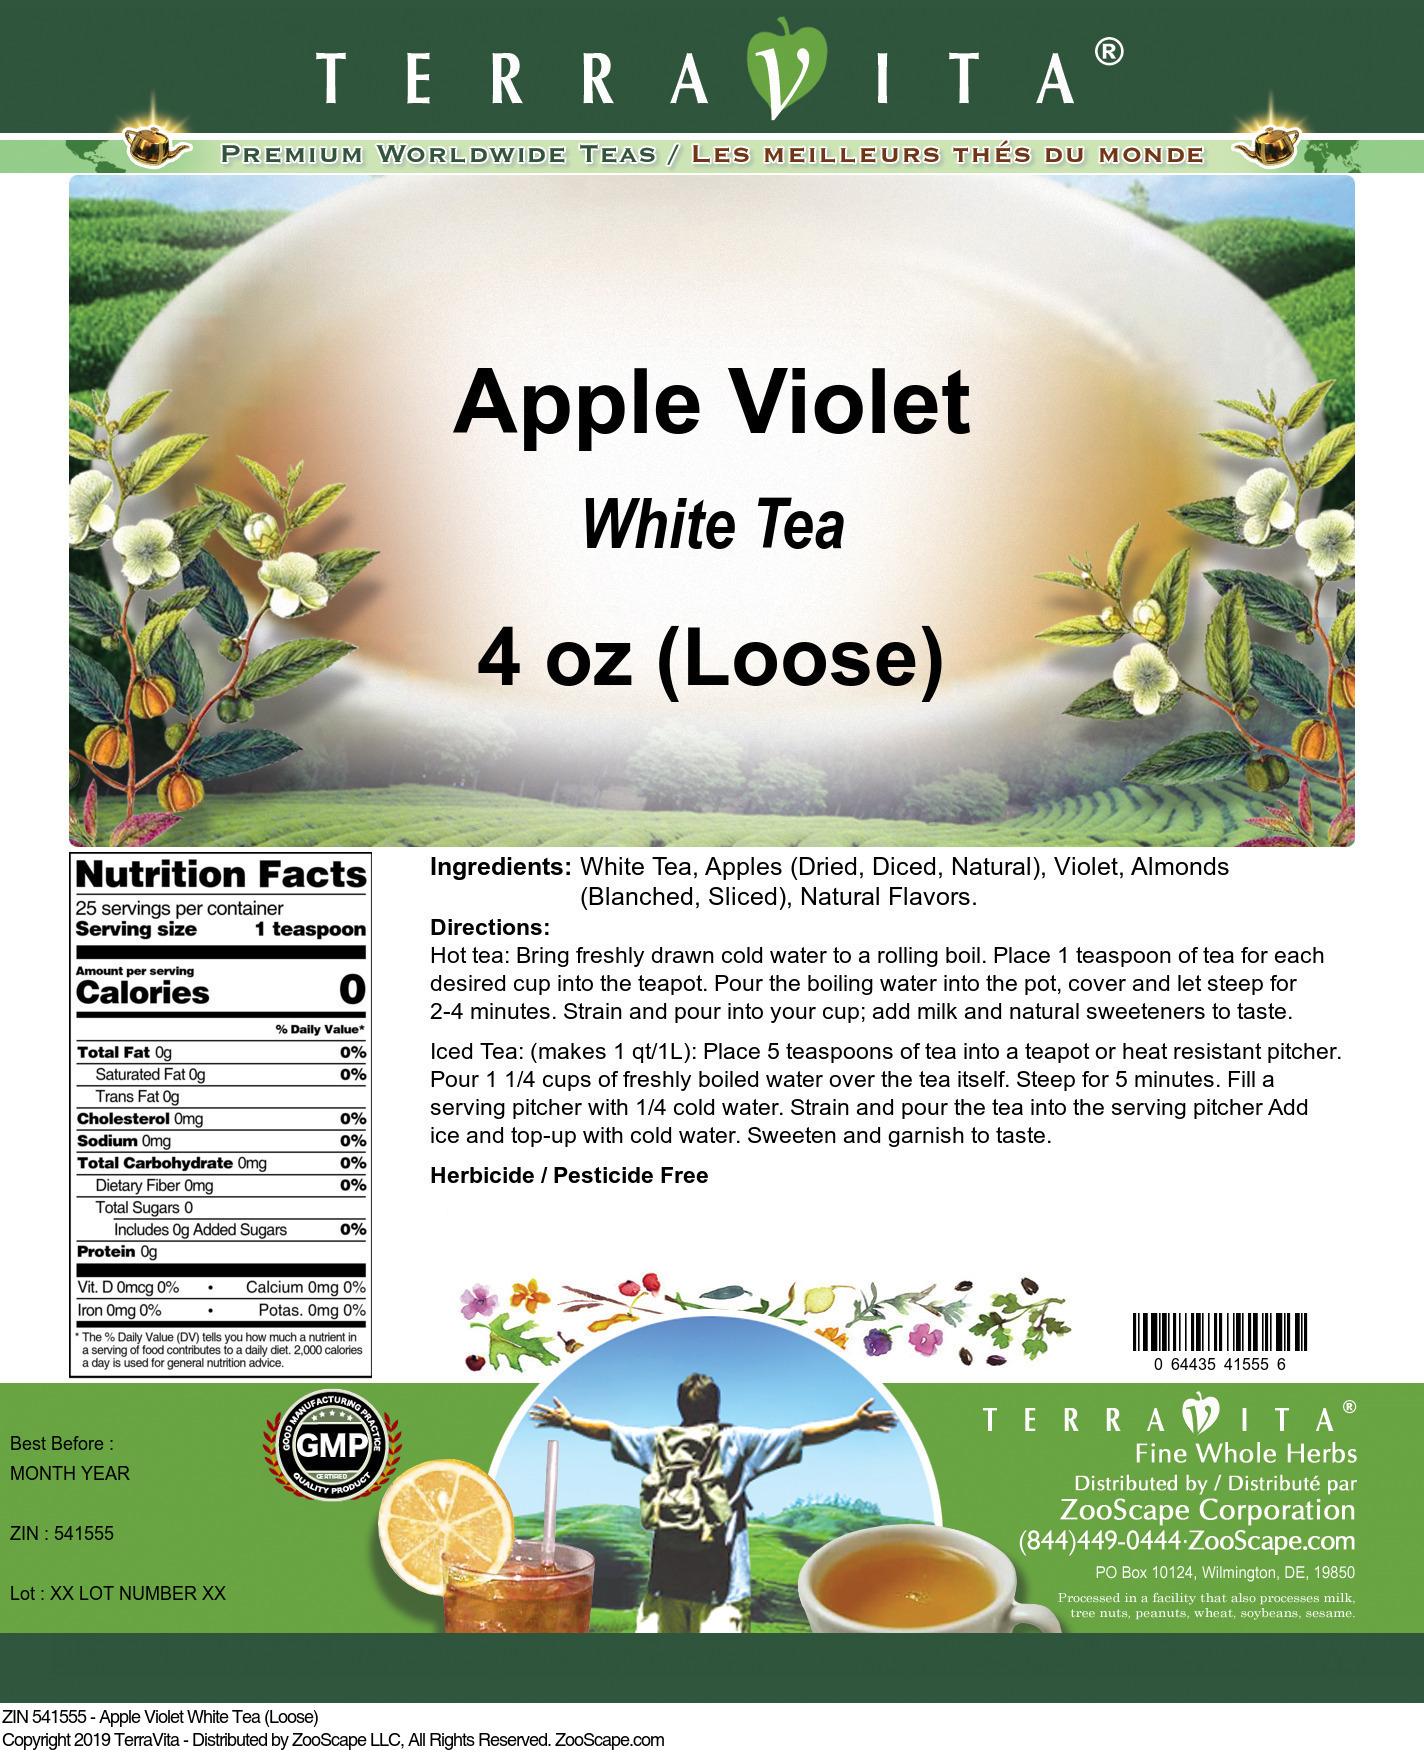 Apple Violet White Tea (Loose)